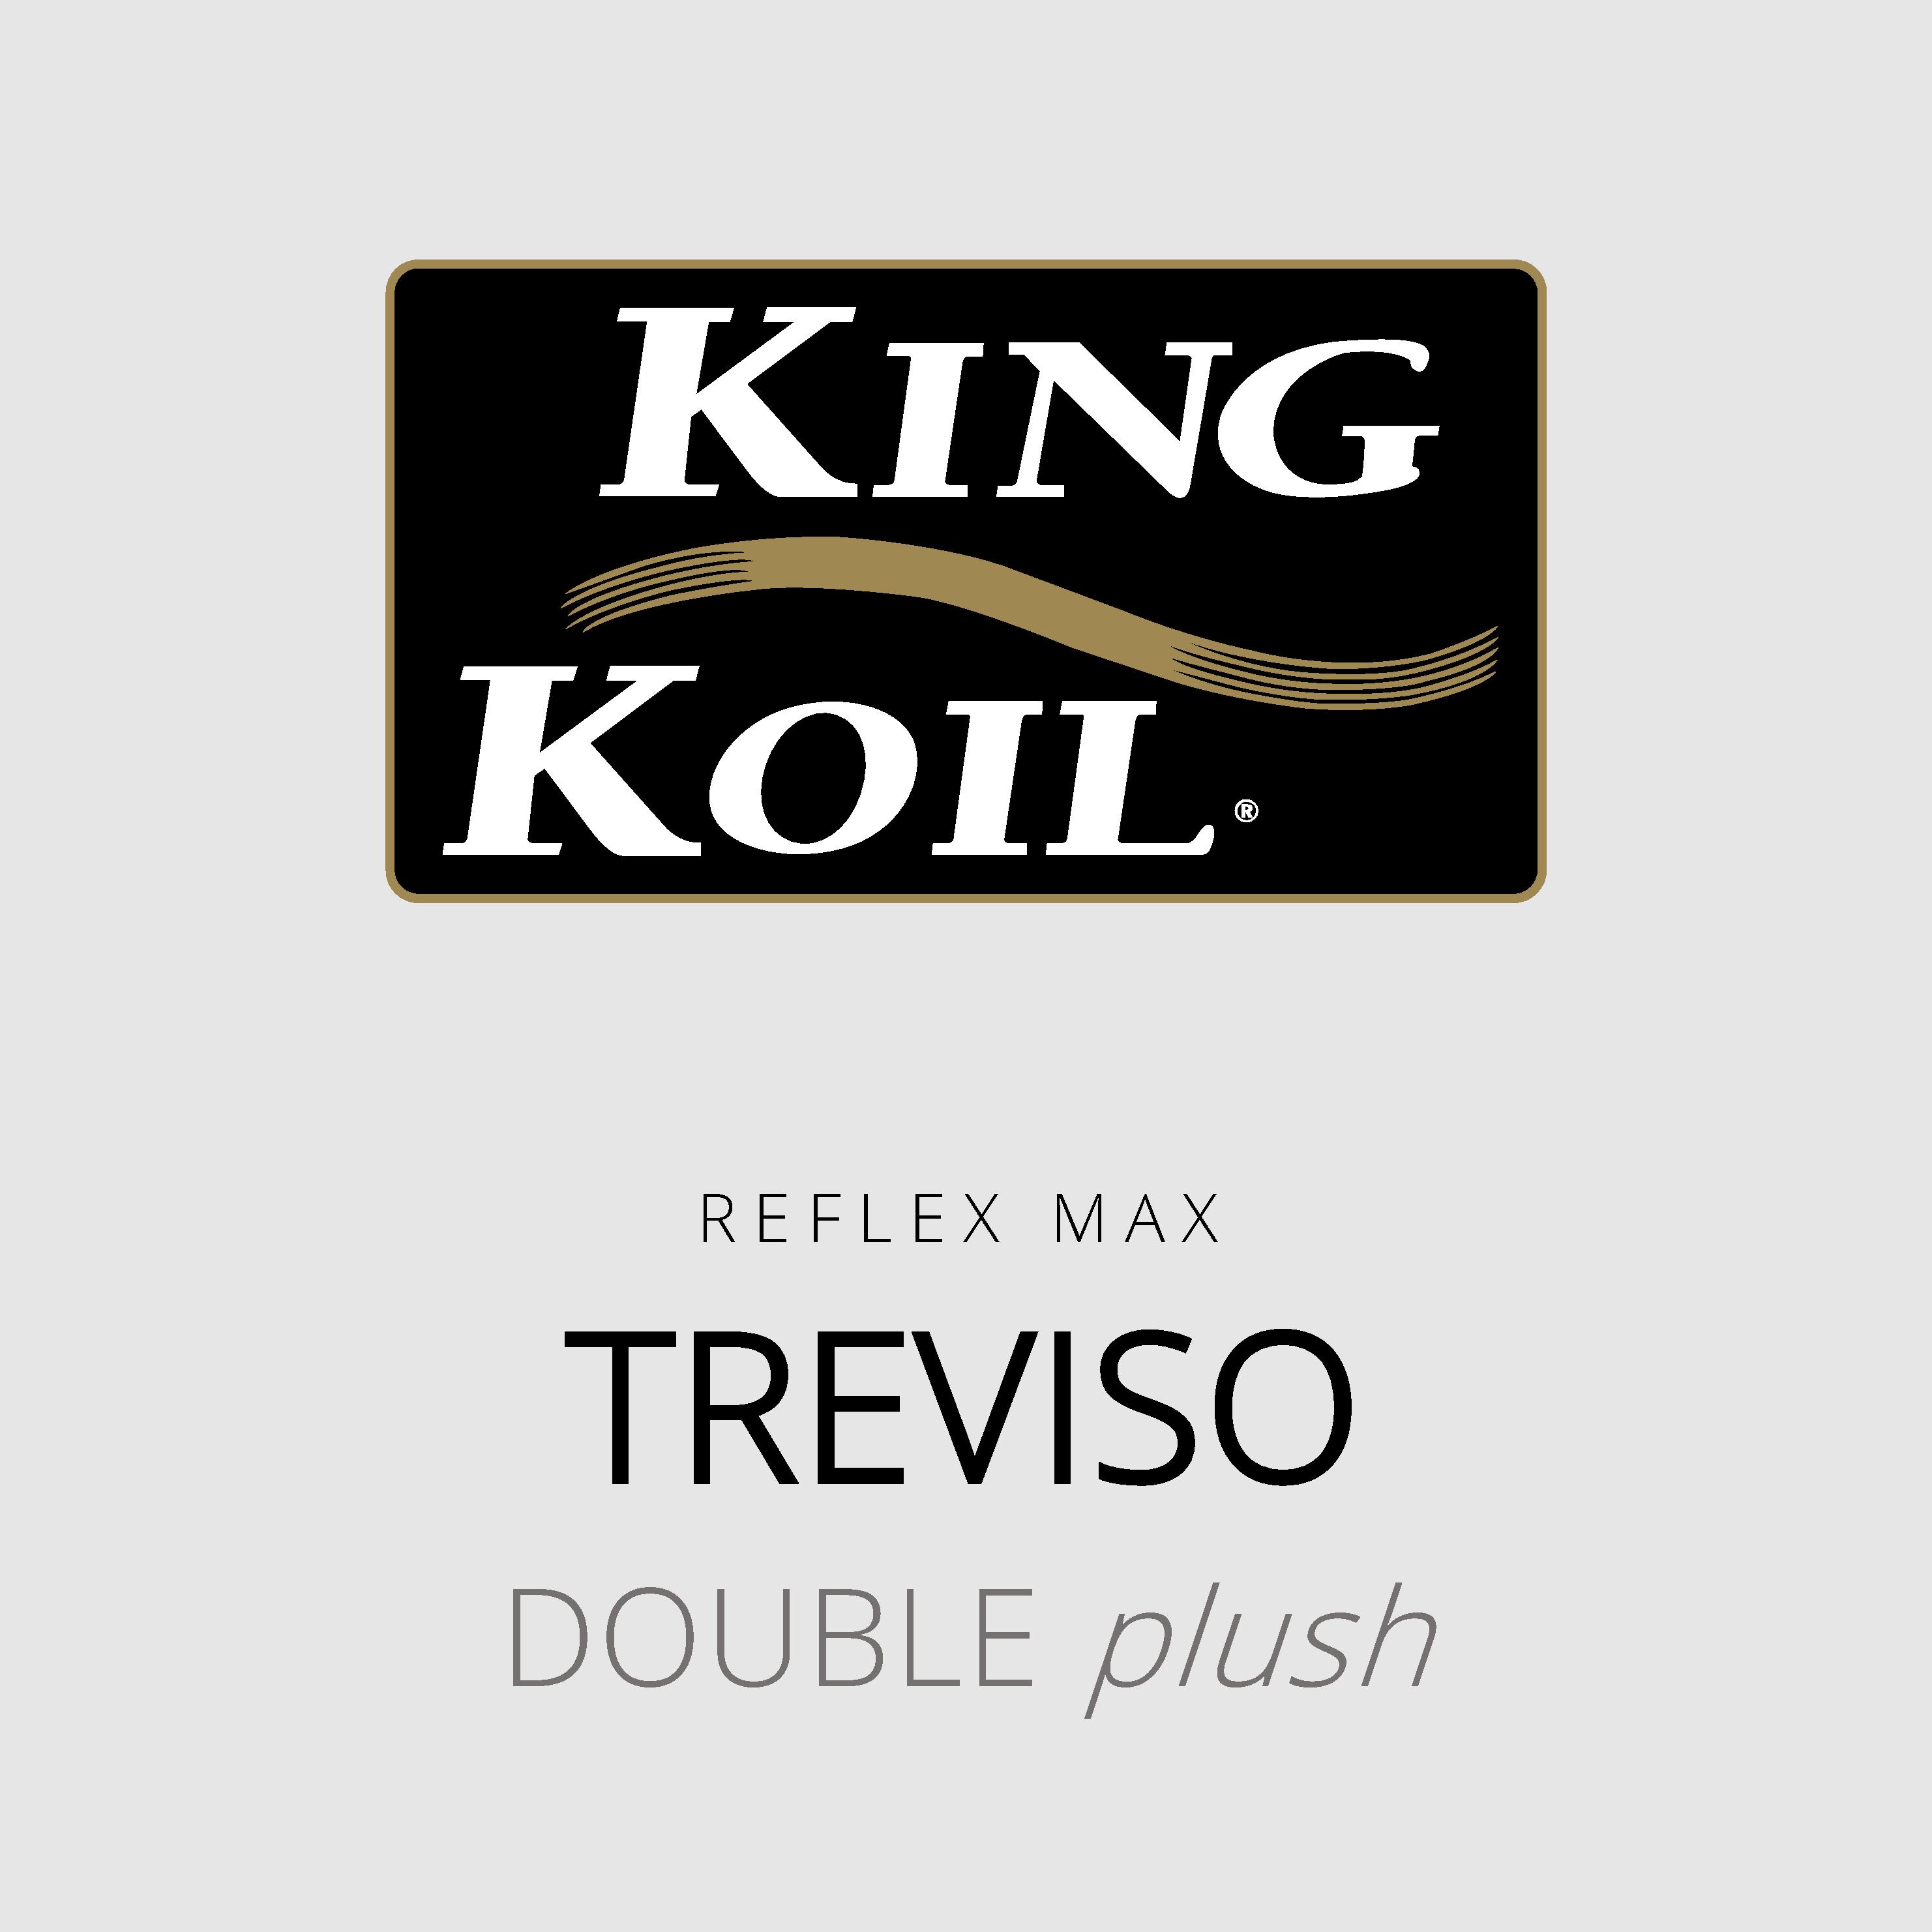 King Koil – Treviso – Reflex Max – Double Plush Mattress